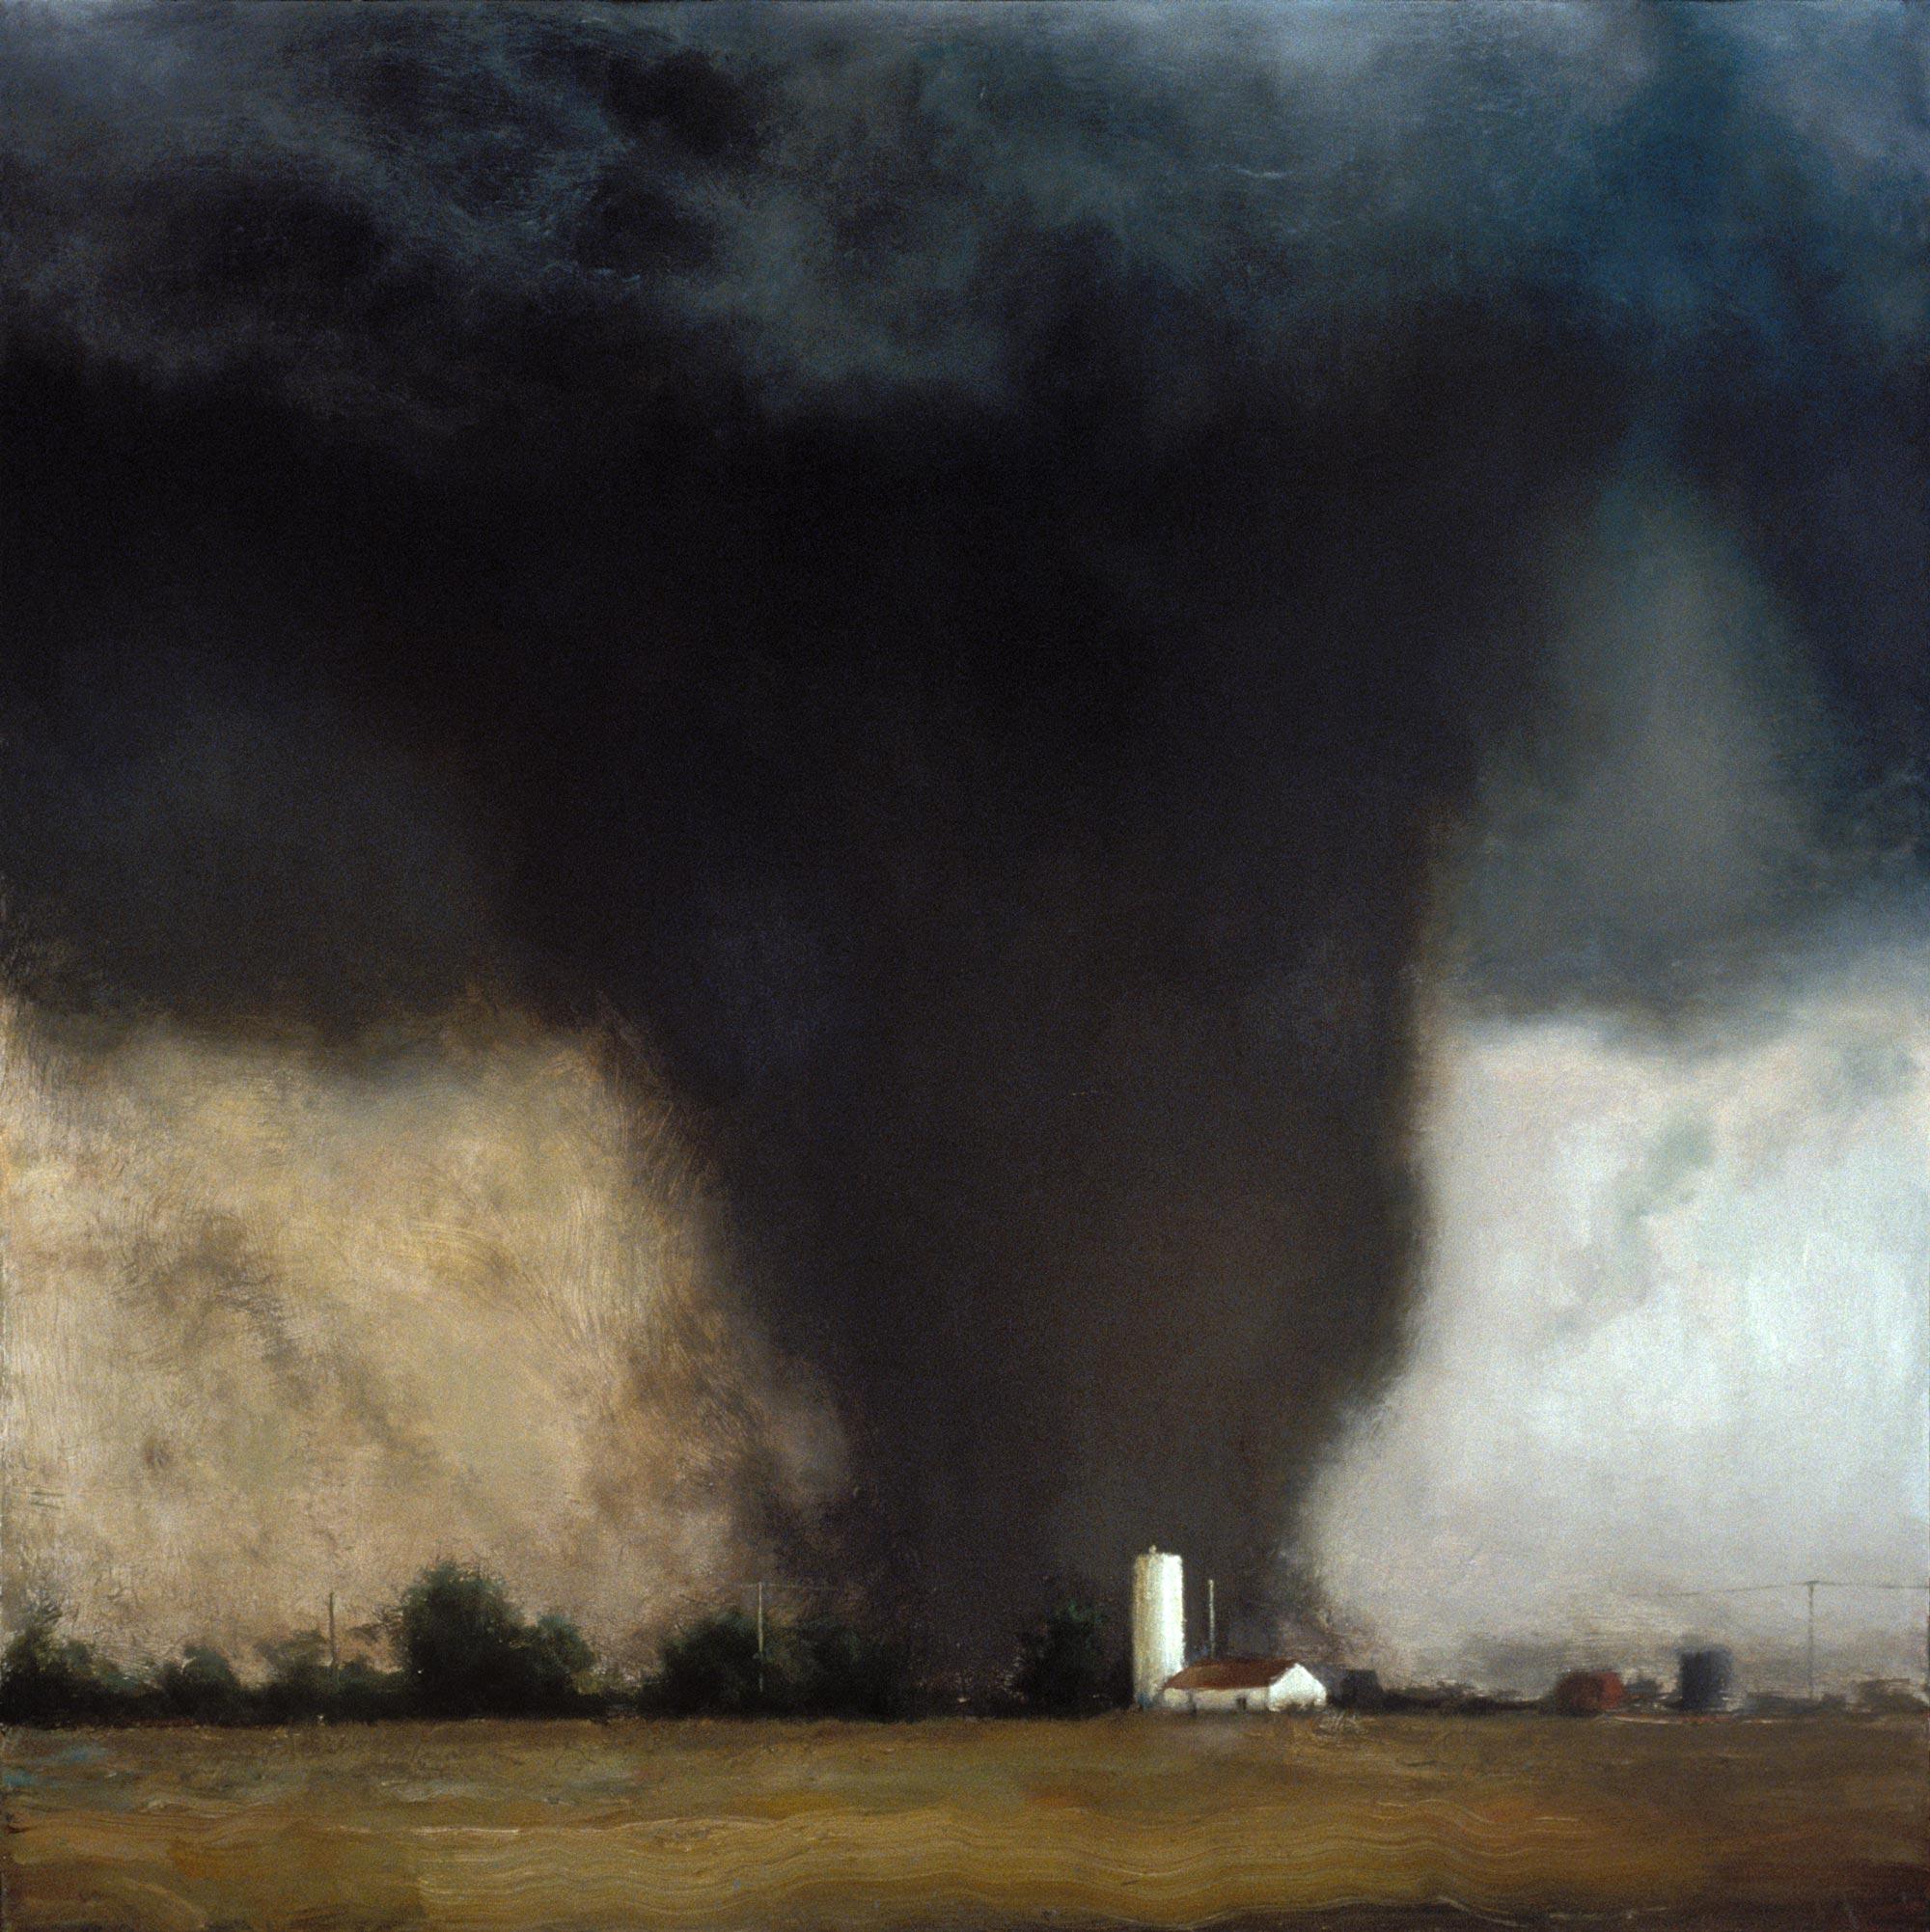 Oklahoma Twister, 48 x 48, oil on canvas, 2002